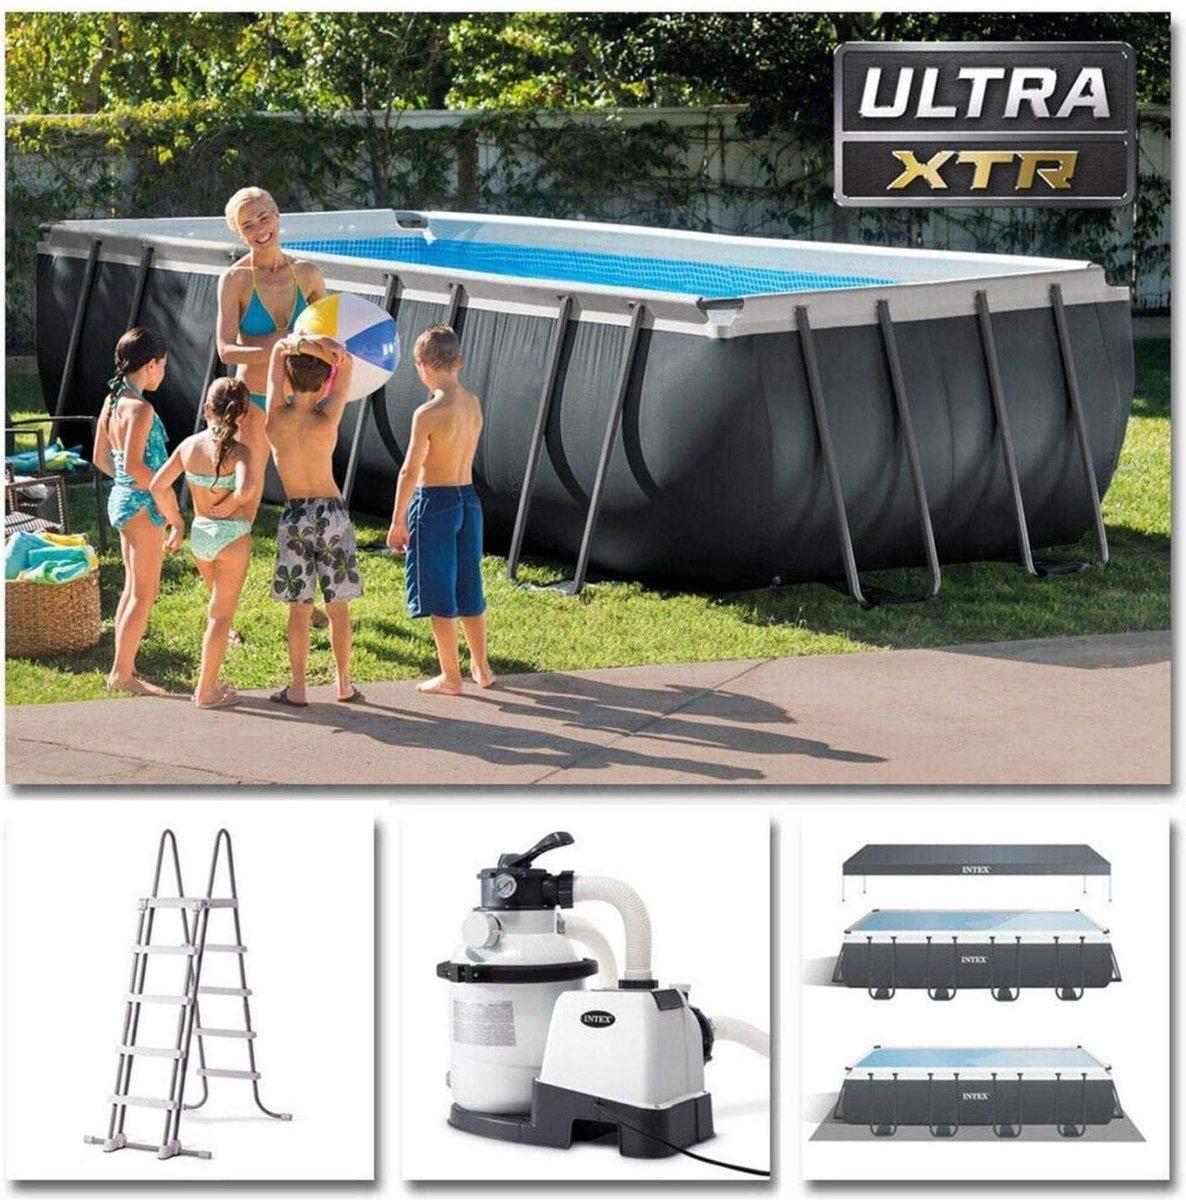 Intex Ultra XTR Rechthoekig Frame Pool 549x274x132 cm PLUG AND PLAY + Zandfilterpomp / Ladder / Afdekzeil / Onderzeil / DIRECT UIT VOORRAAD LEVERBAAR!